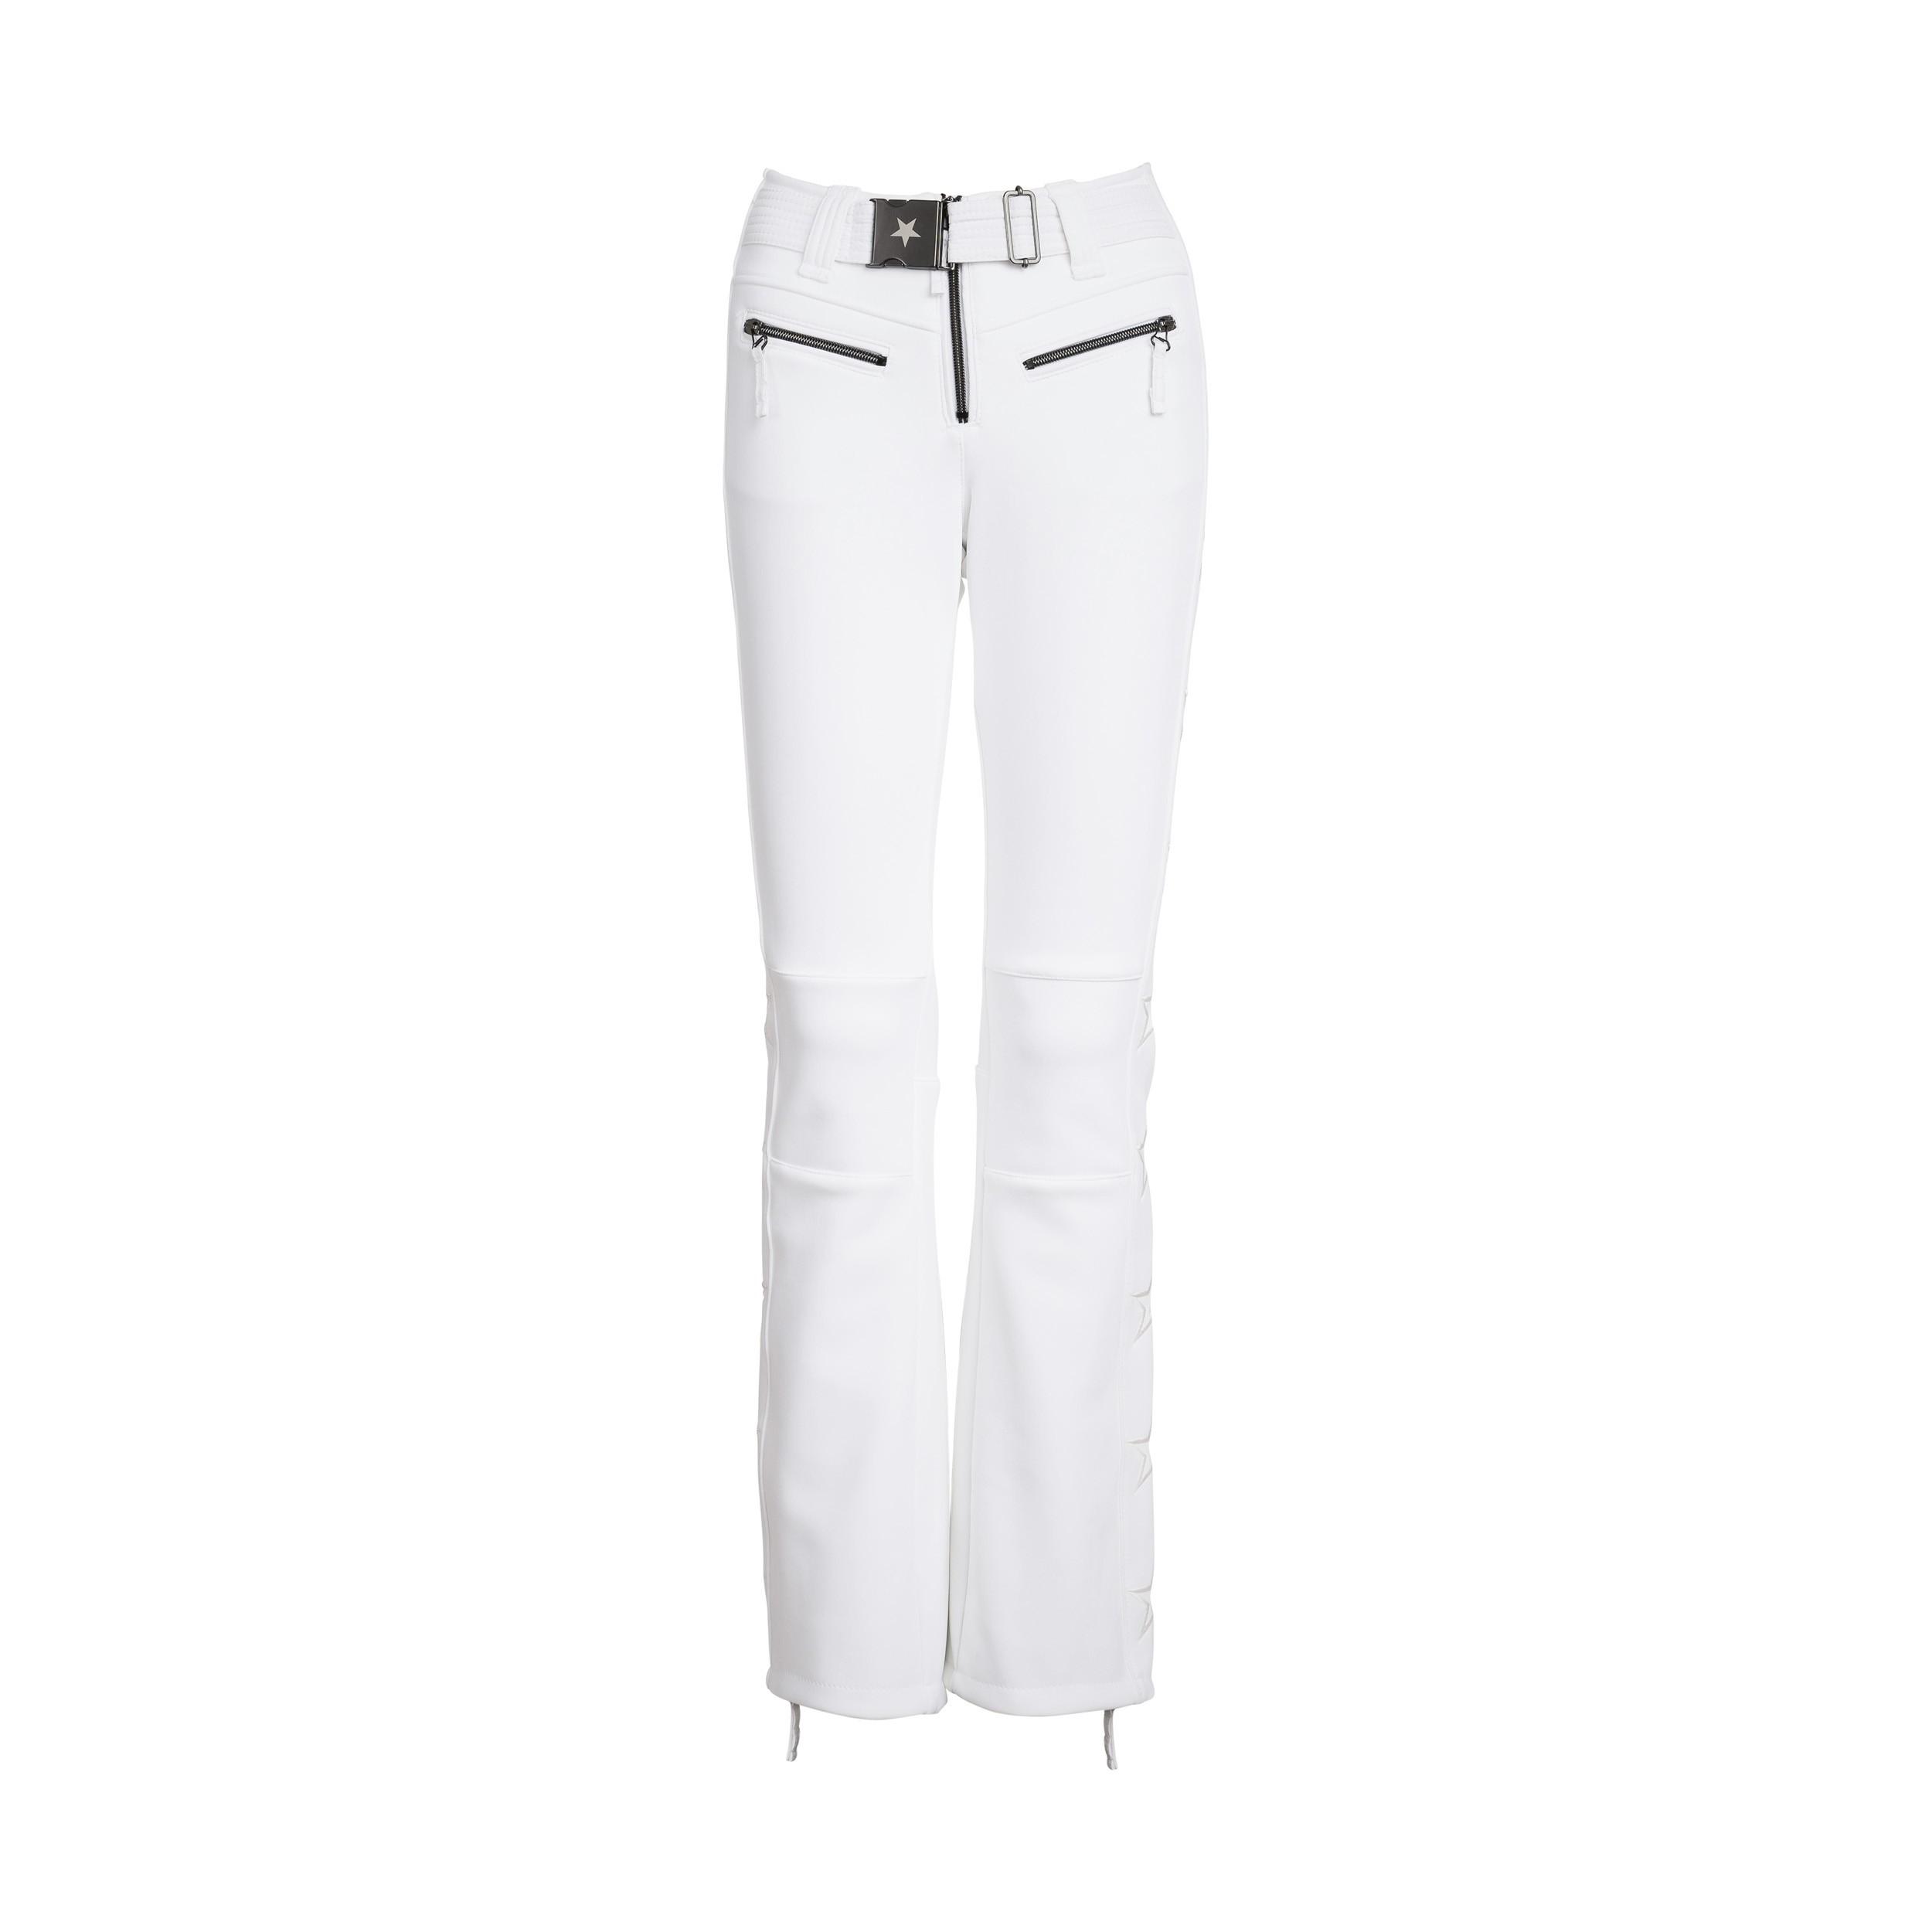 Jet Set Damen Skihose Tiby Uni Bright White